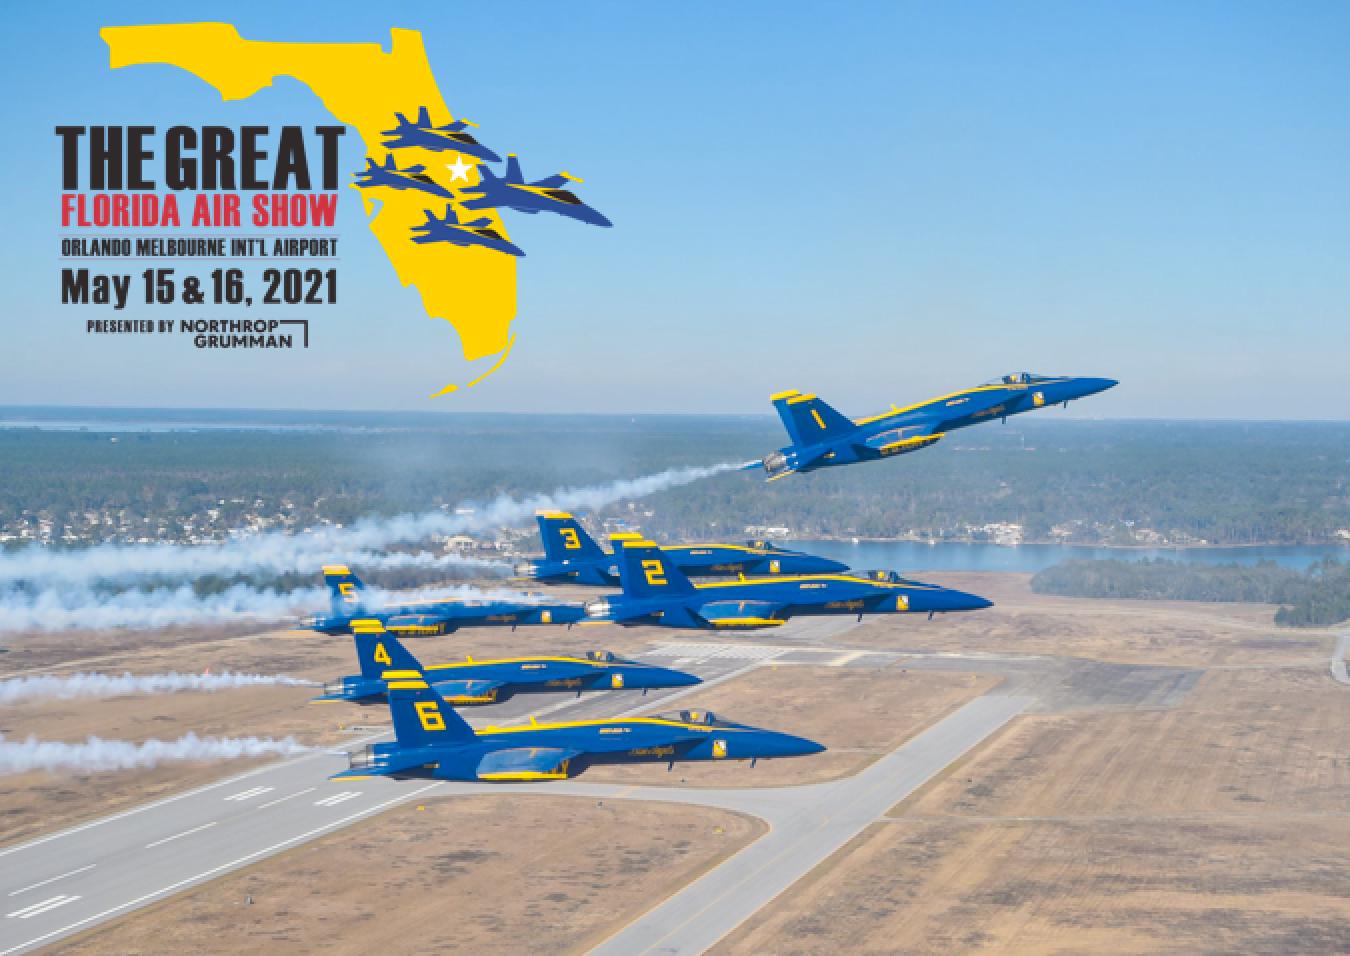 Great Florida Air Show